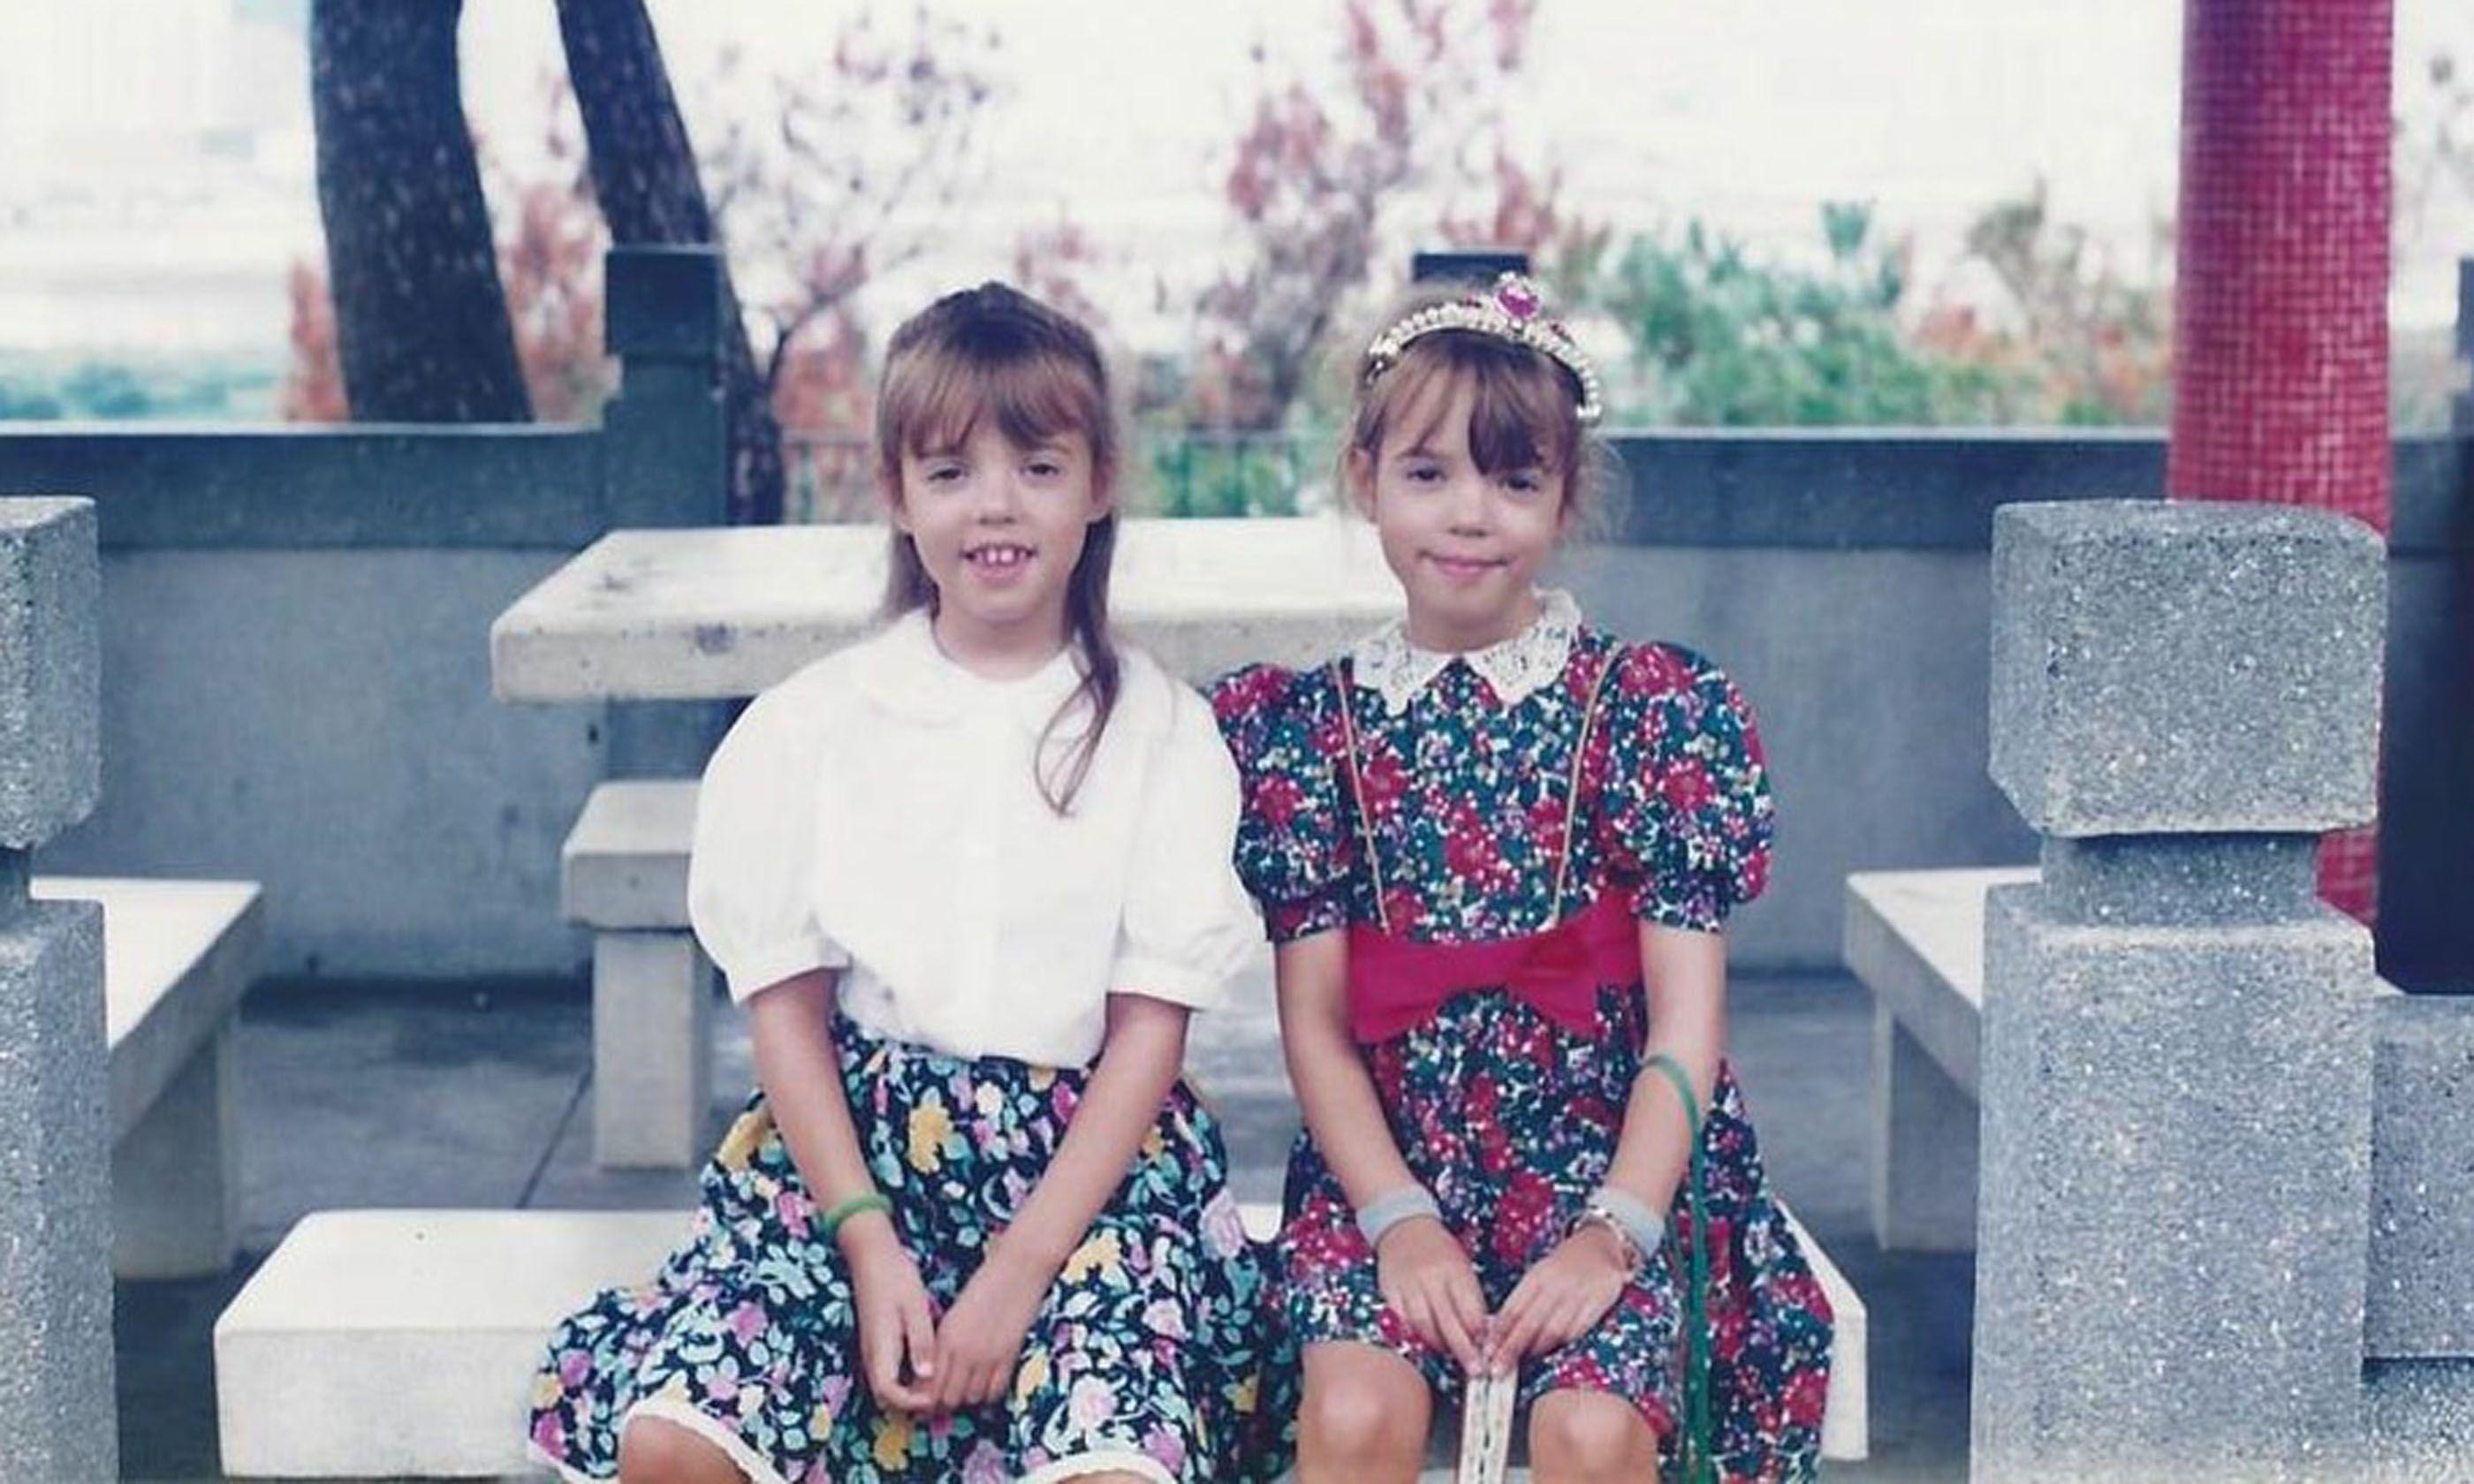 Growing up in Hong Kong (Rowan family archives)